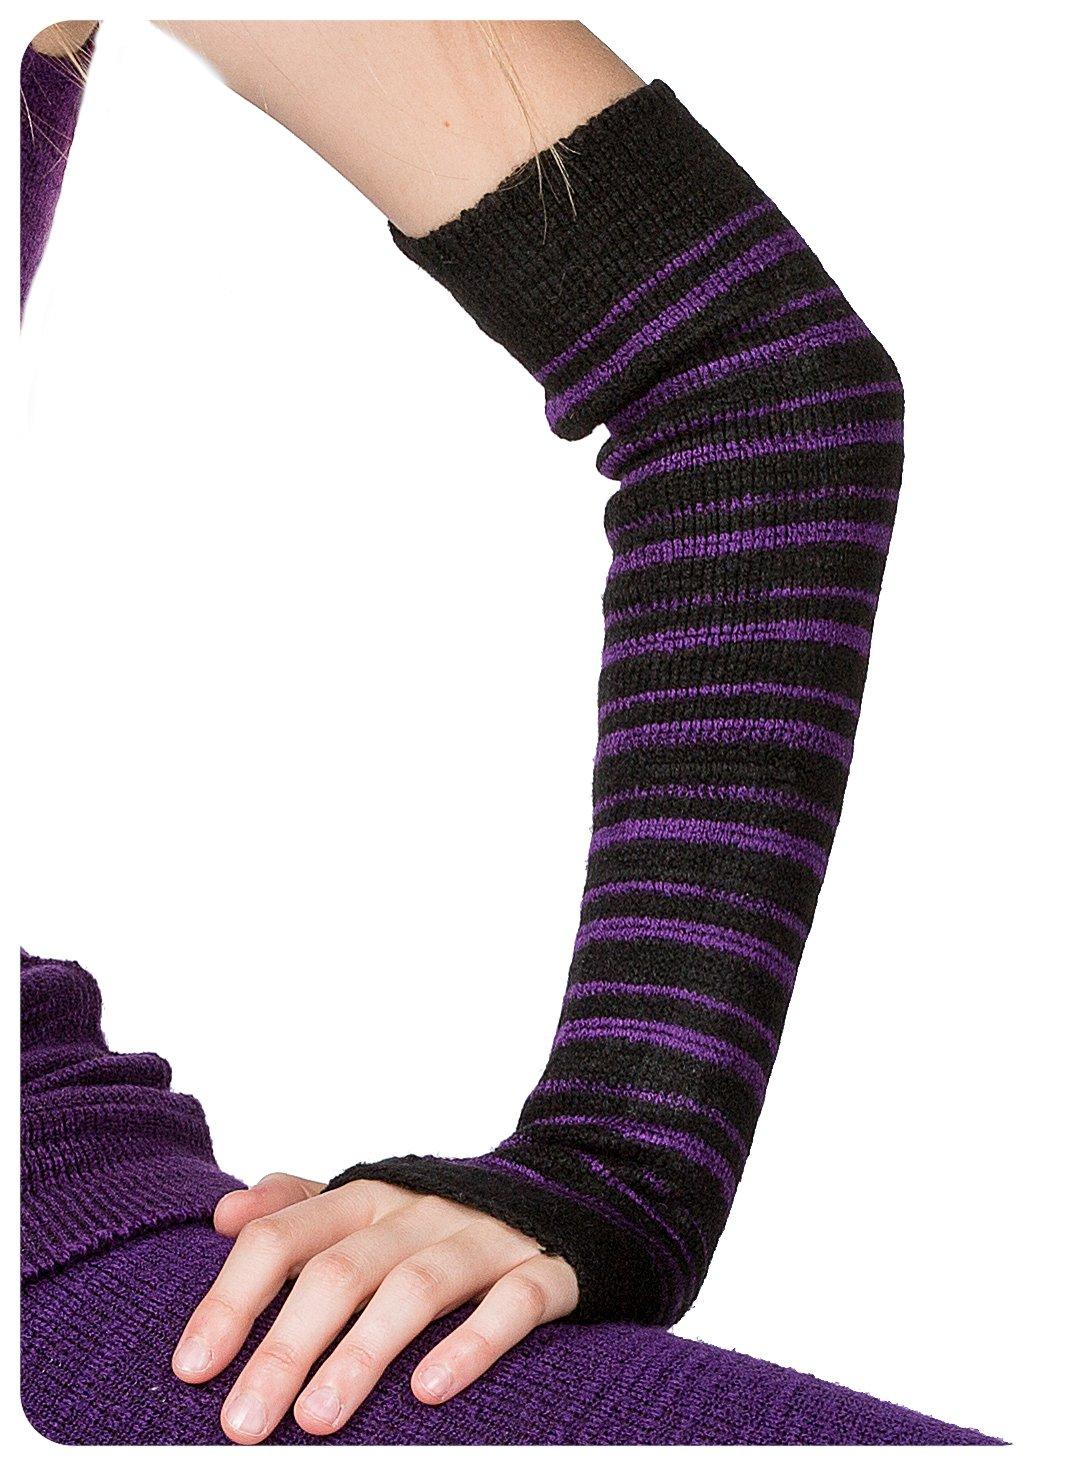 Black & Purple Striped Arm Warmer KD dance New York Sexy, Fashionable & Fingerless Arm Warmers Thumb Hole #MadeInUSA Happy New Year 2018 @KDdanceNewYork by KD dance New York (Image #5)